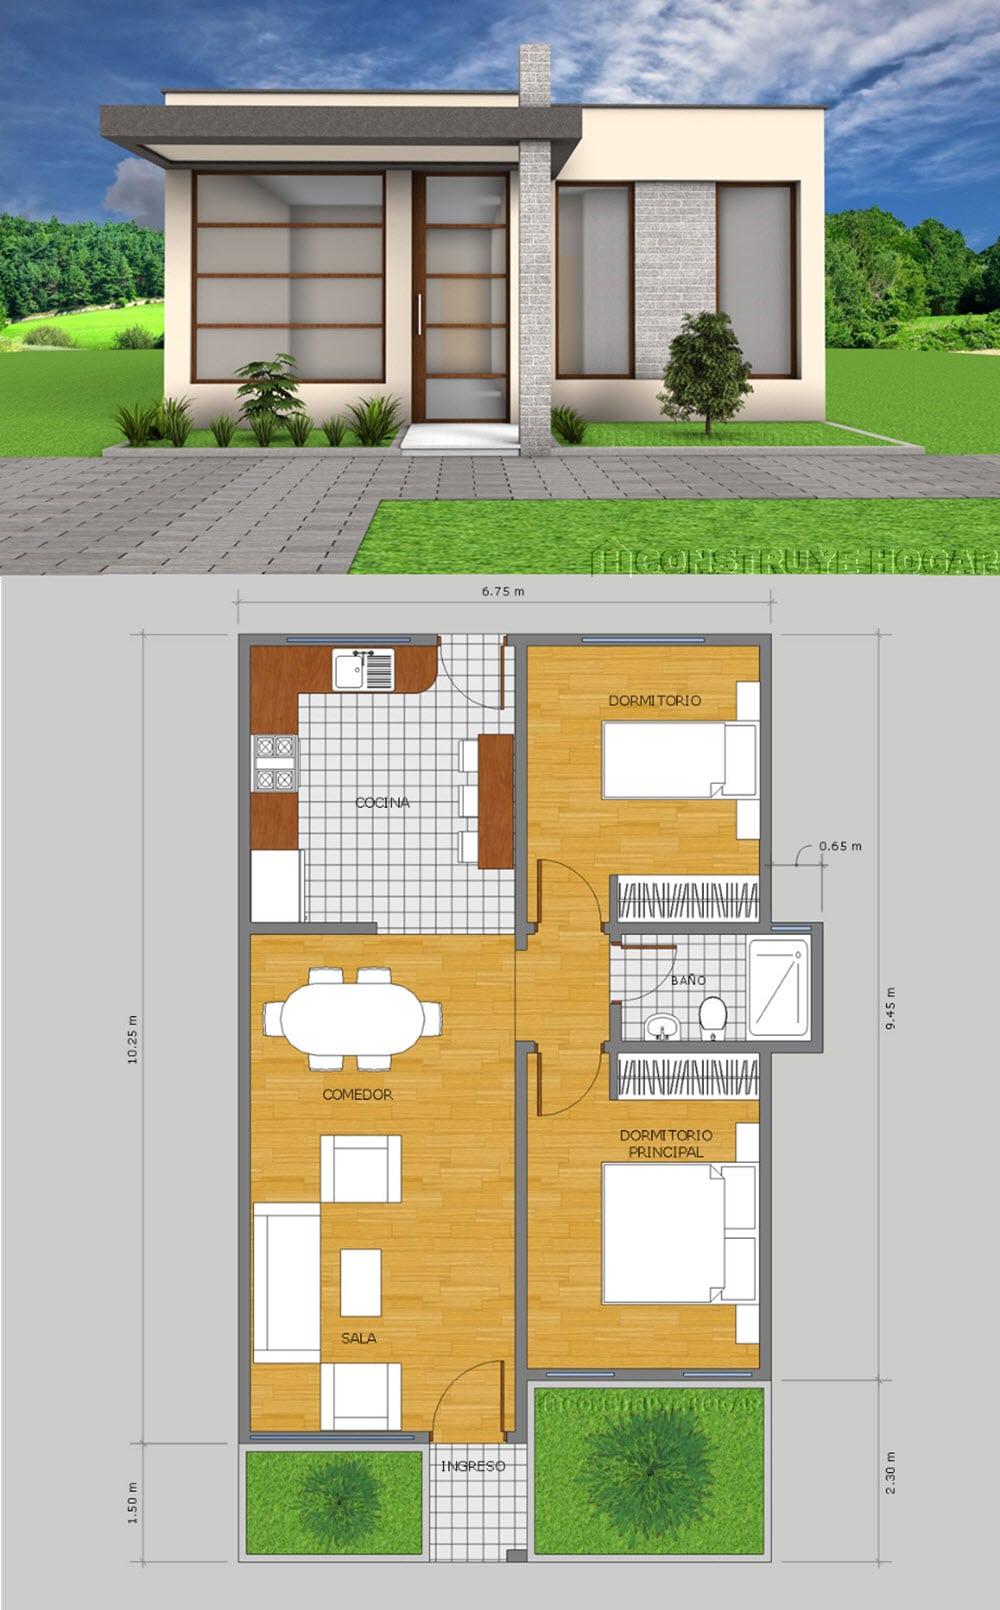 Planos de casas ideas de dise o para construir for Casa de una planta sencilla